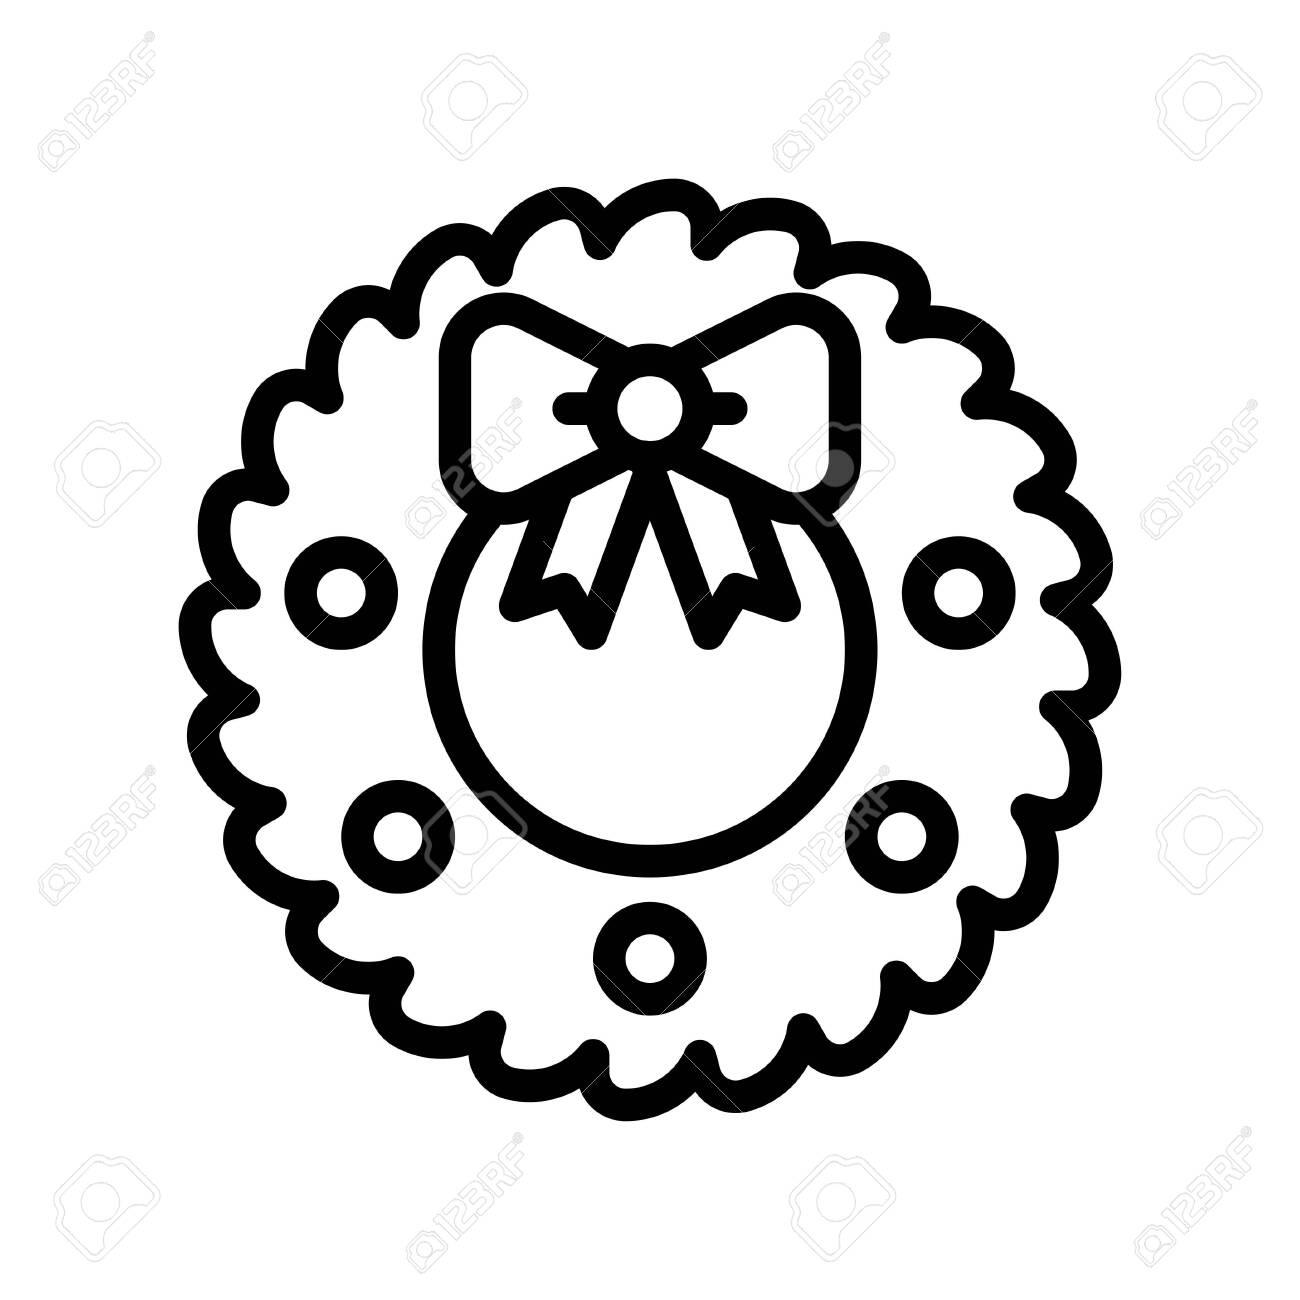 Christmas Wreath vector illustration, line style icon - 136139956